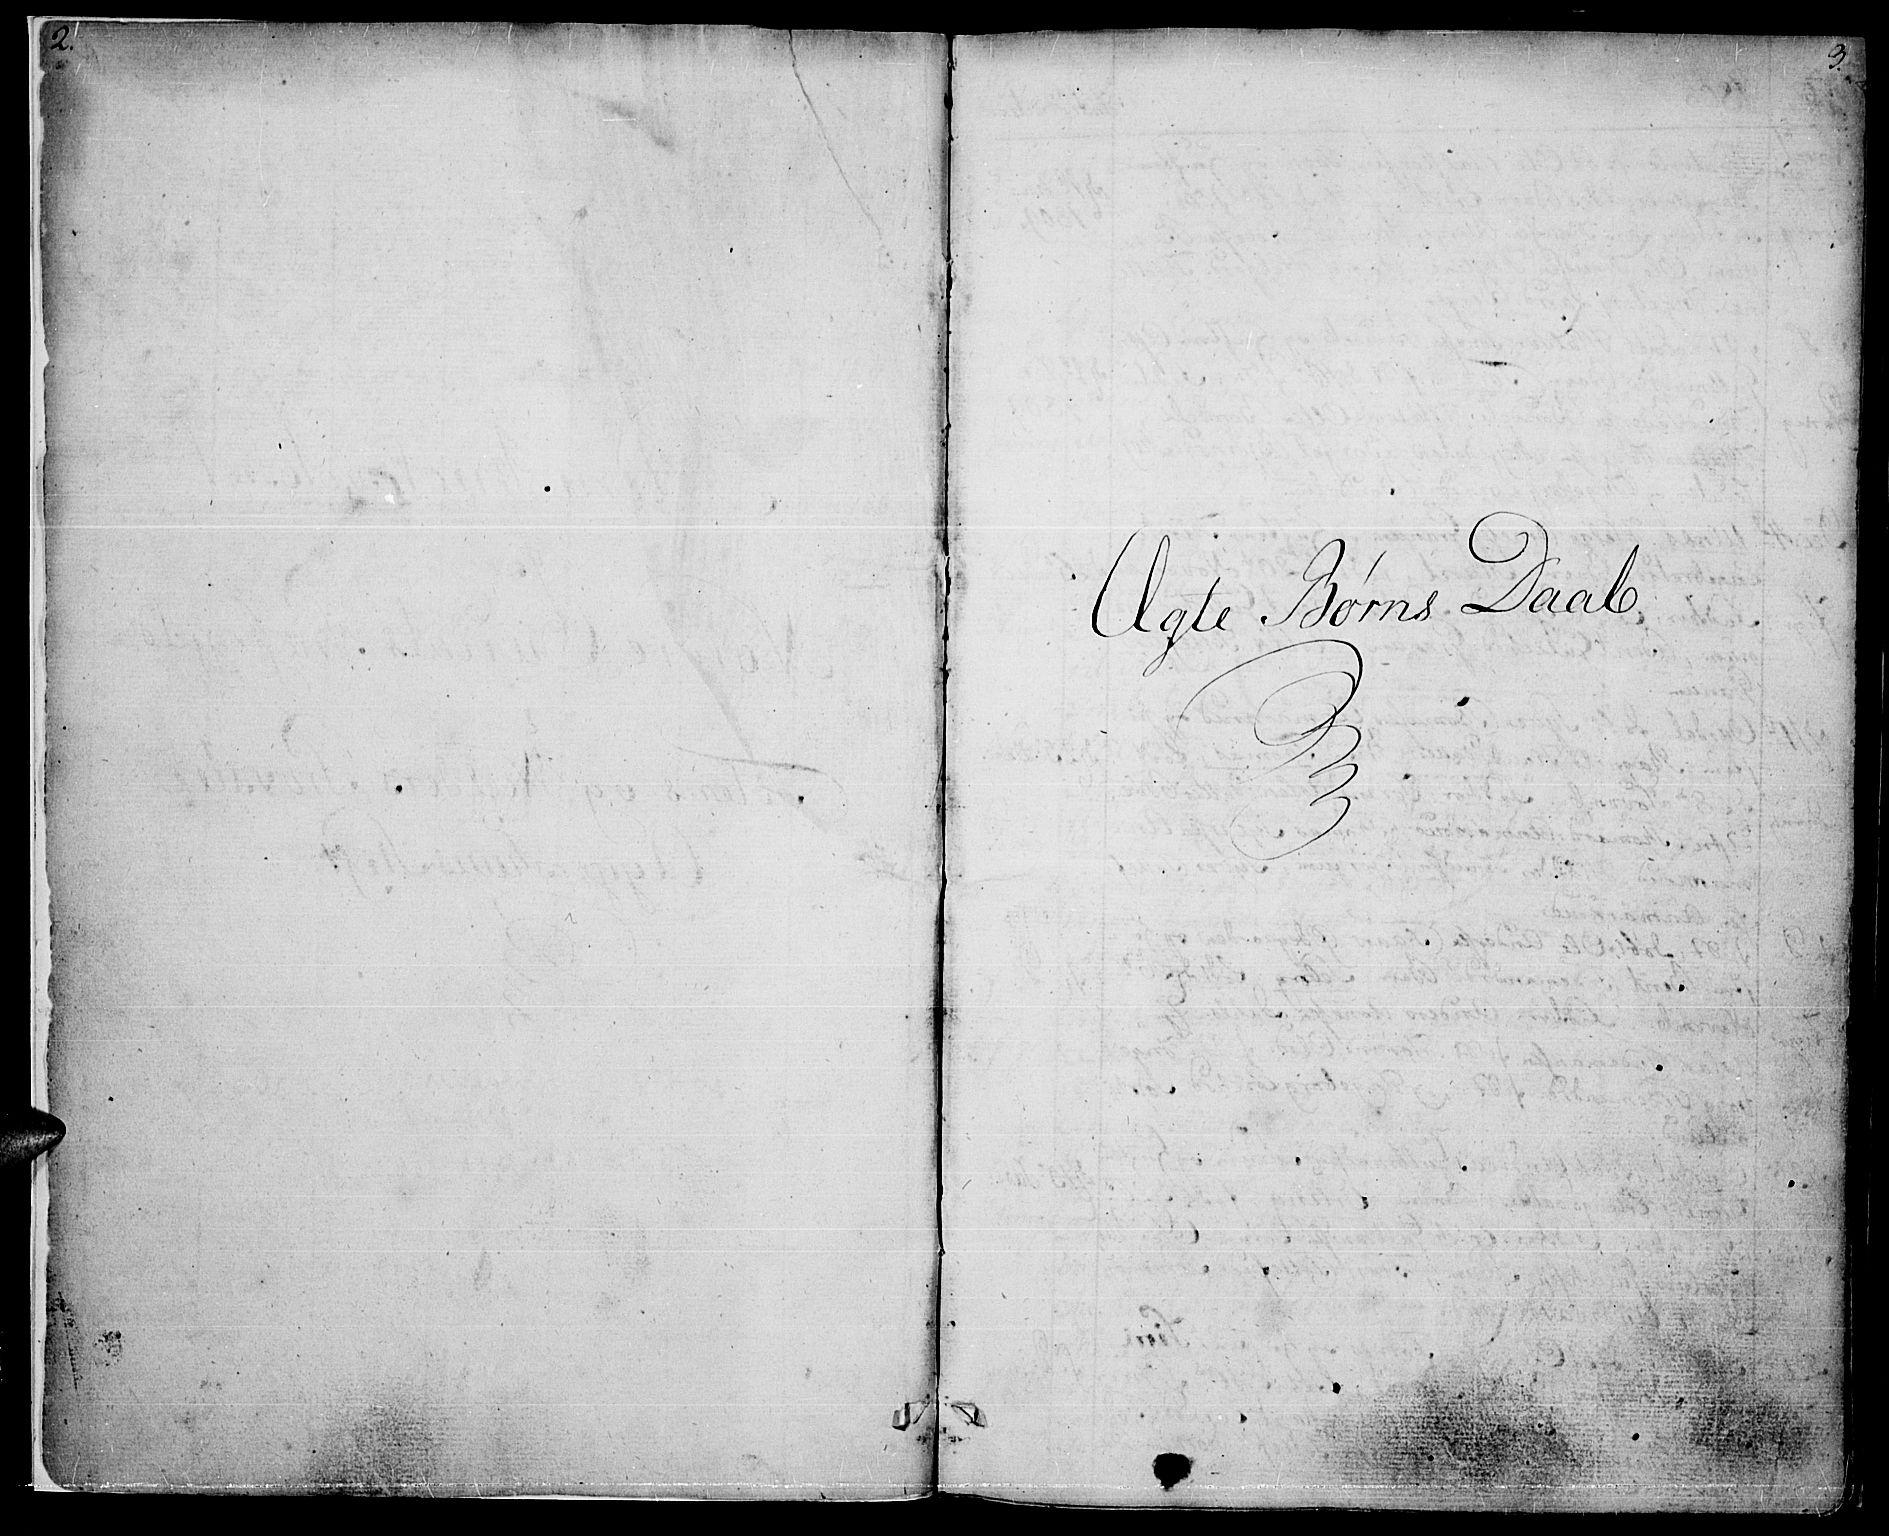 SAH, Nord-Aurdal prestekontor, Ministerialbok nr. 1, 1808-1815, s. 2-3